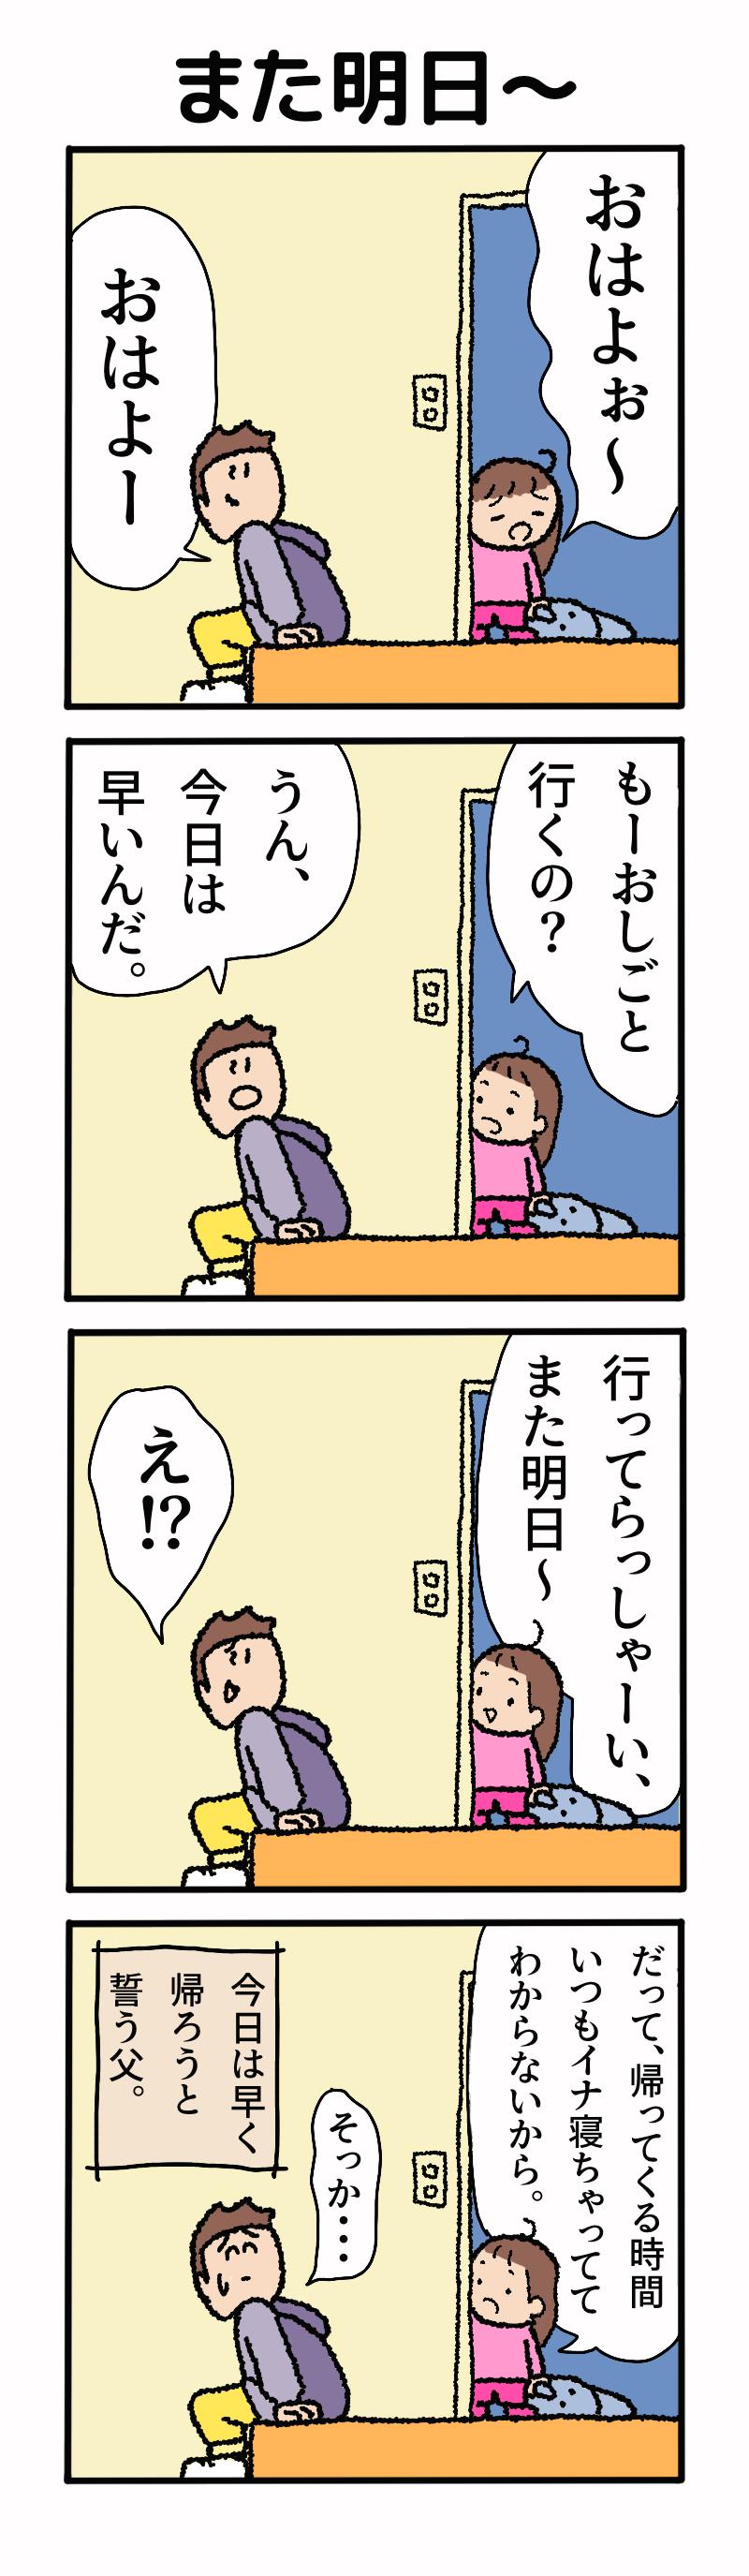 WEB漫画6話